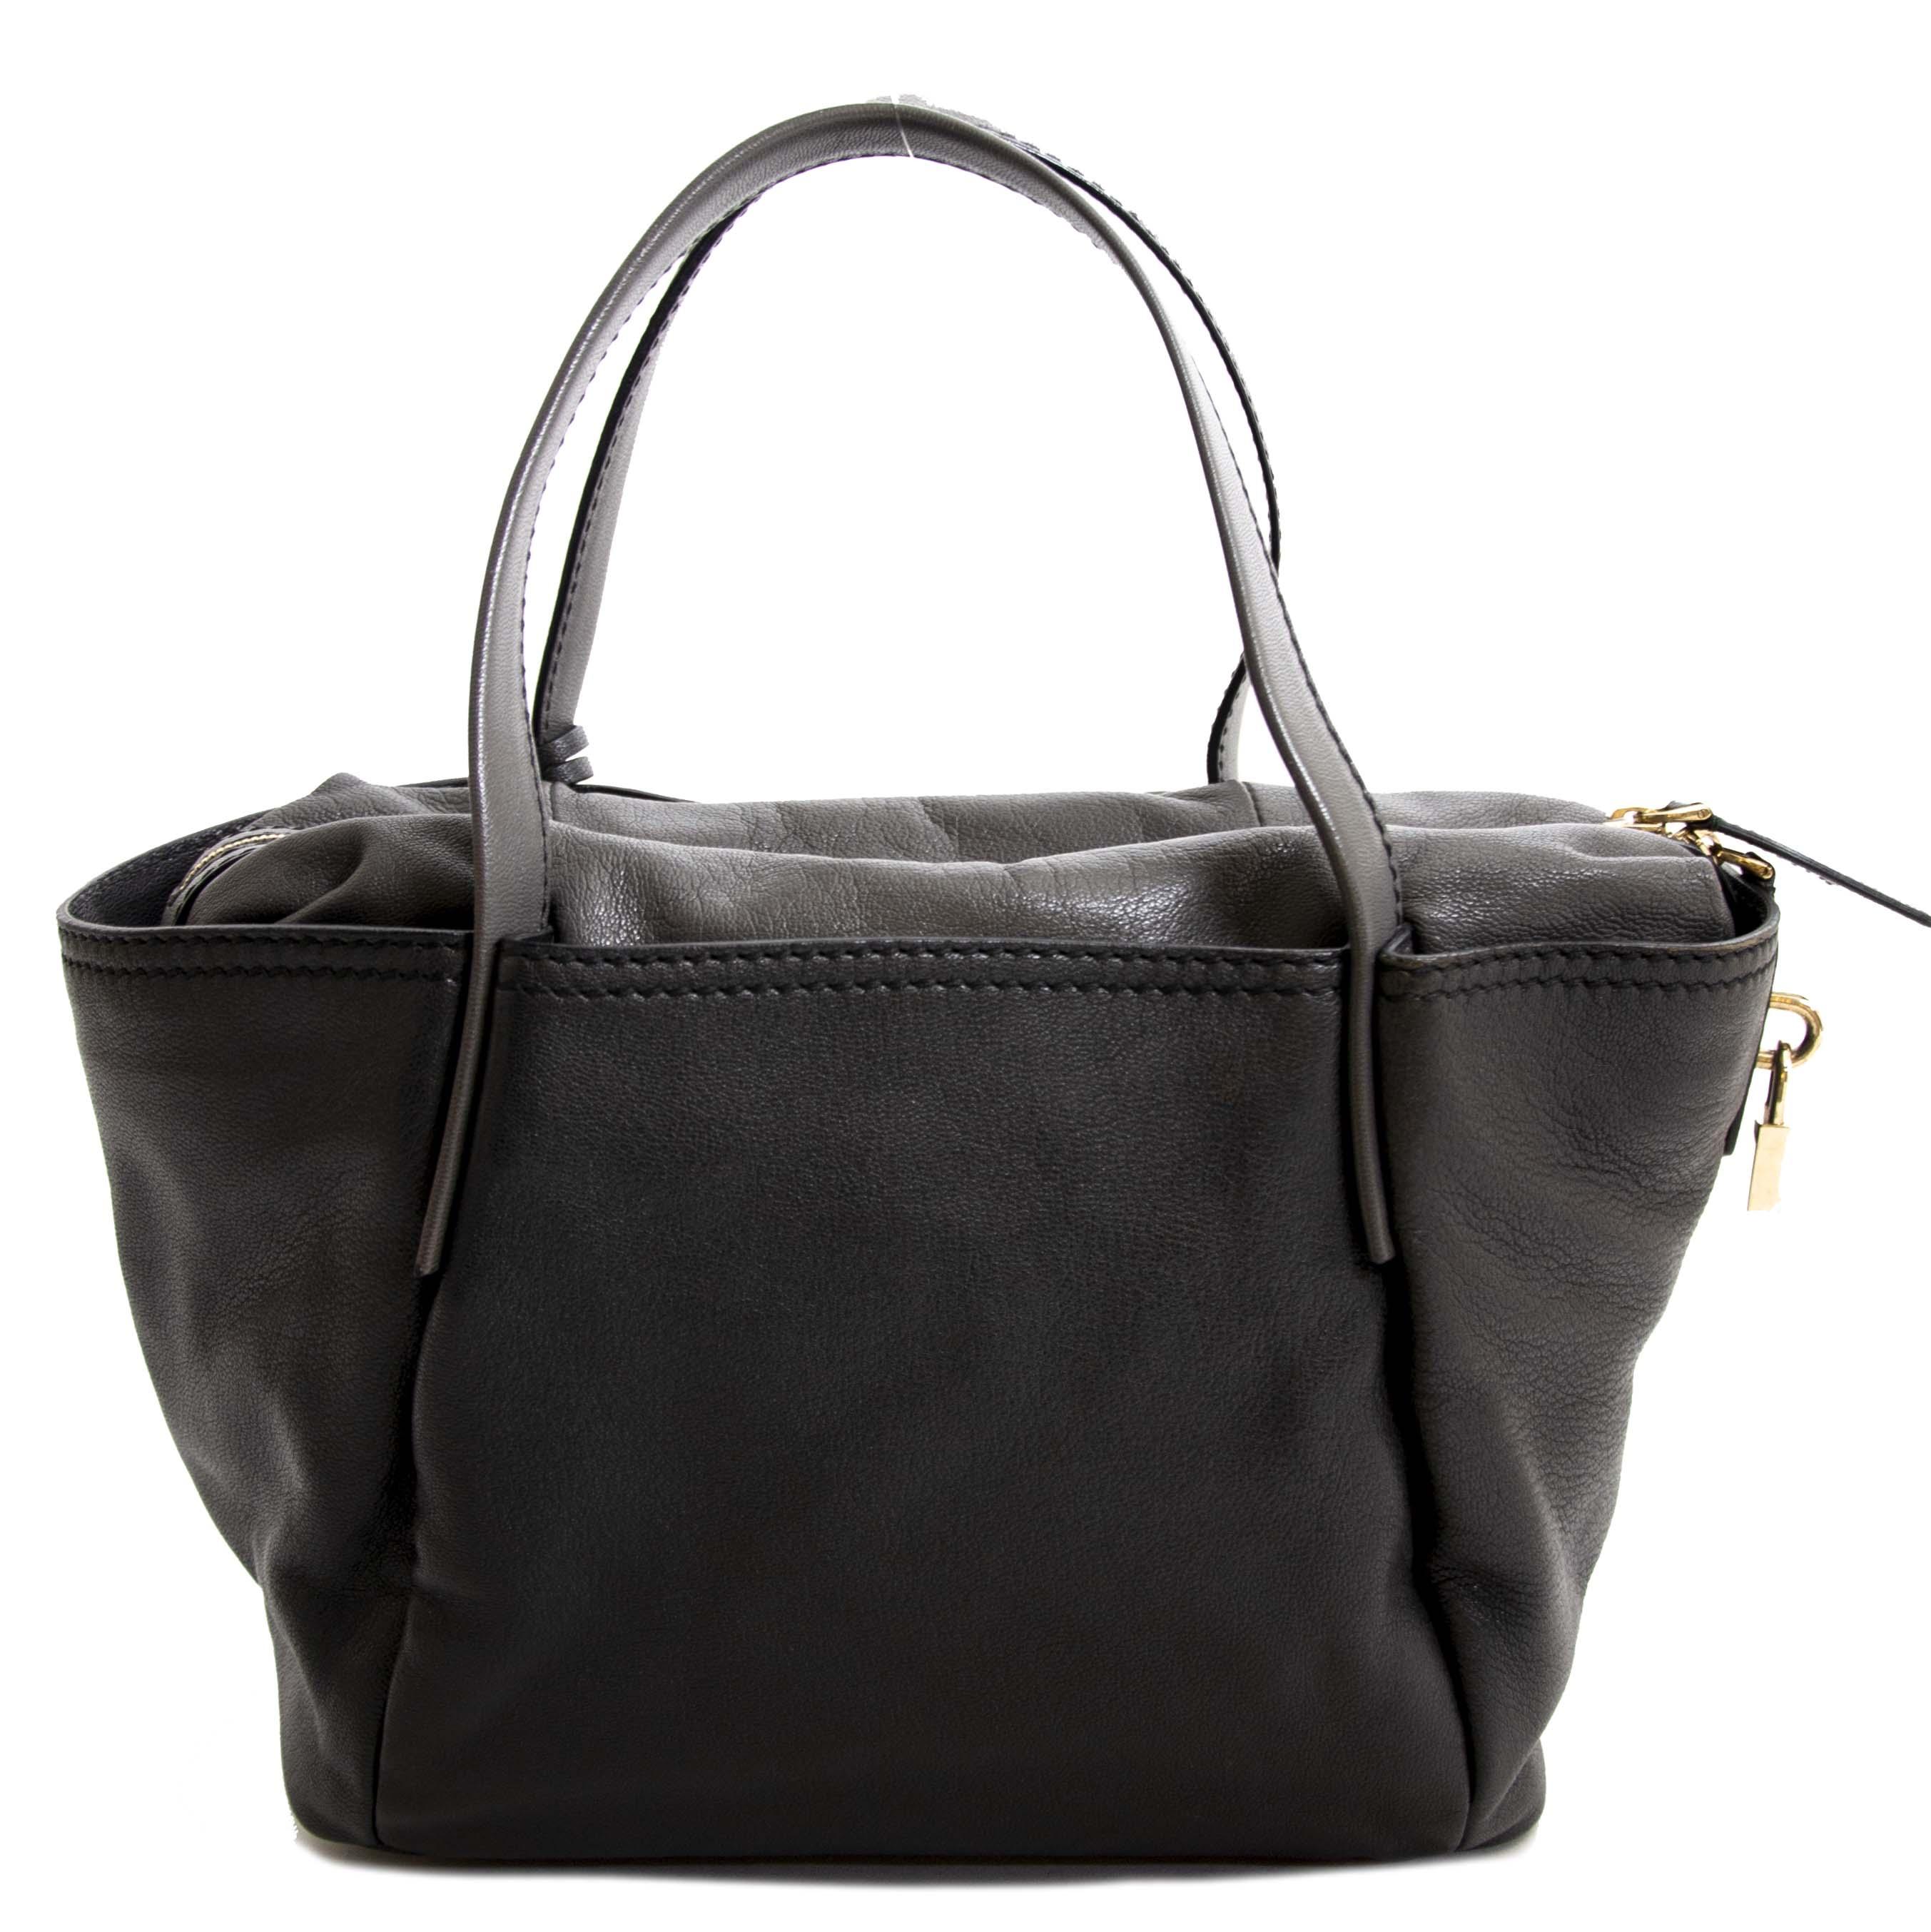 b696f8851151 ... Authentic second hand vintage Dolce   Gabbana Ilenia Bag shop online  webshop LabelLOV